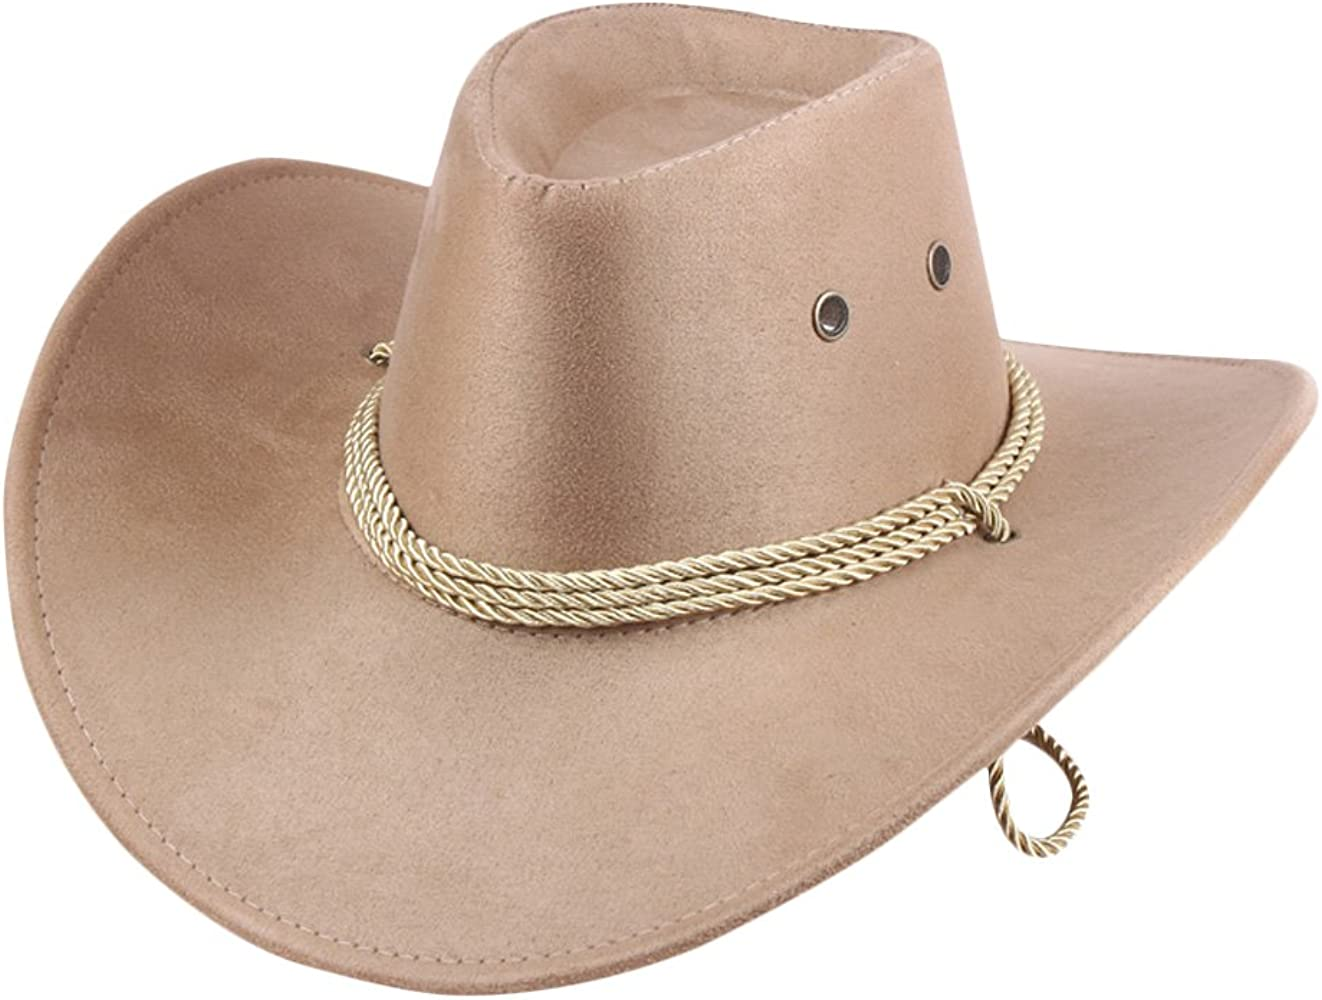 40f1d89fad5c2 UwantC Mens Faux Felt Western Cowboy Hat Fedora Outdoor Wide Brim Hat with  Strap Beige